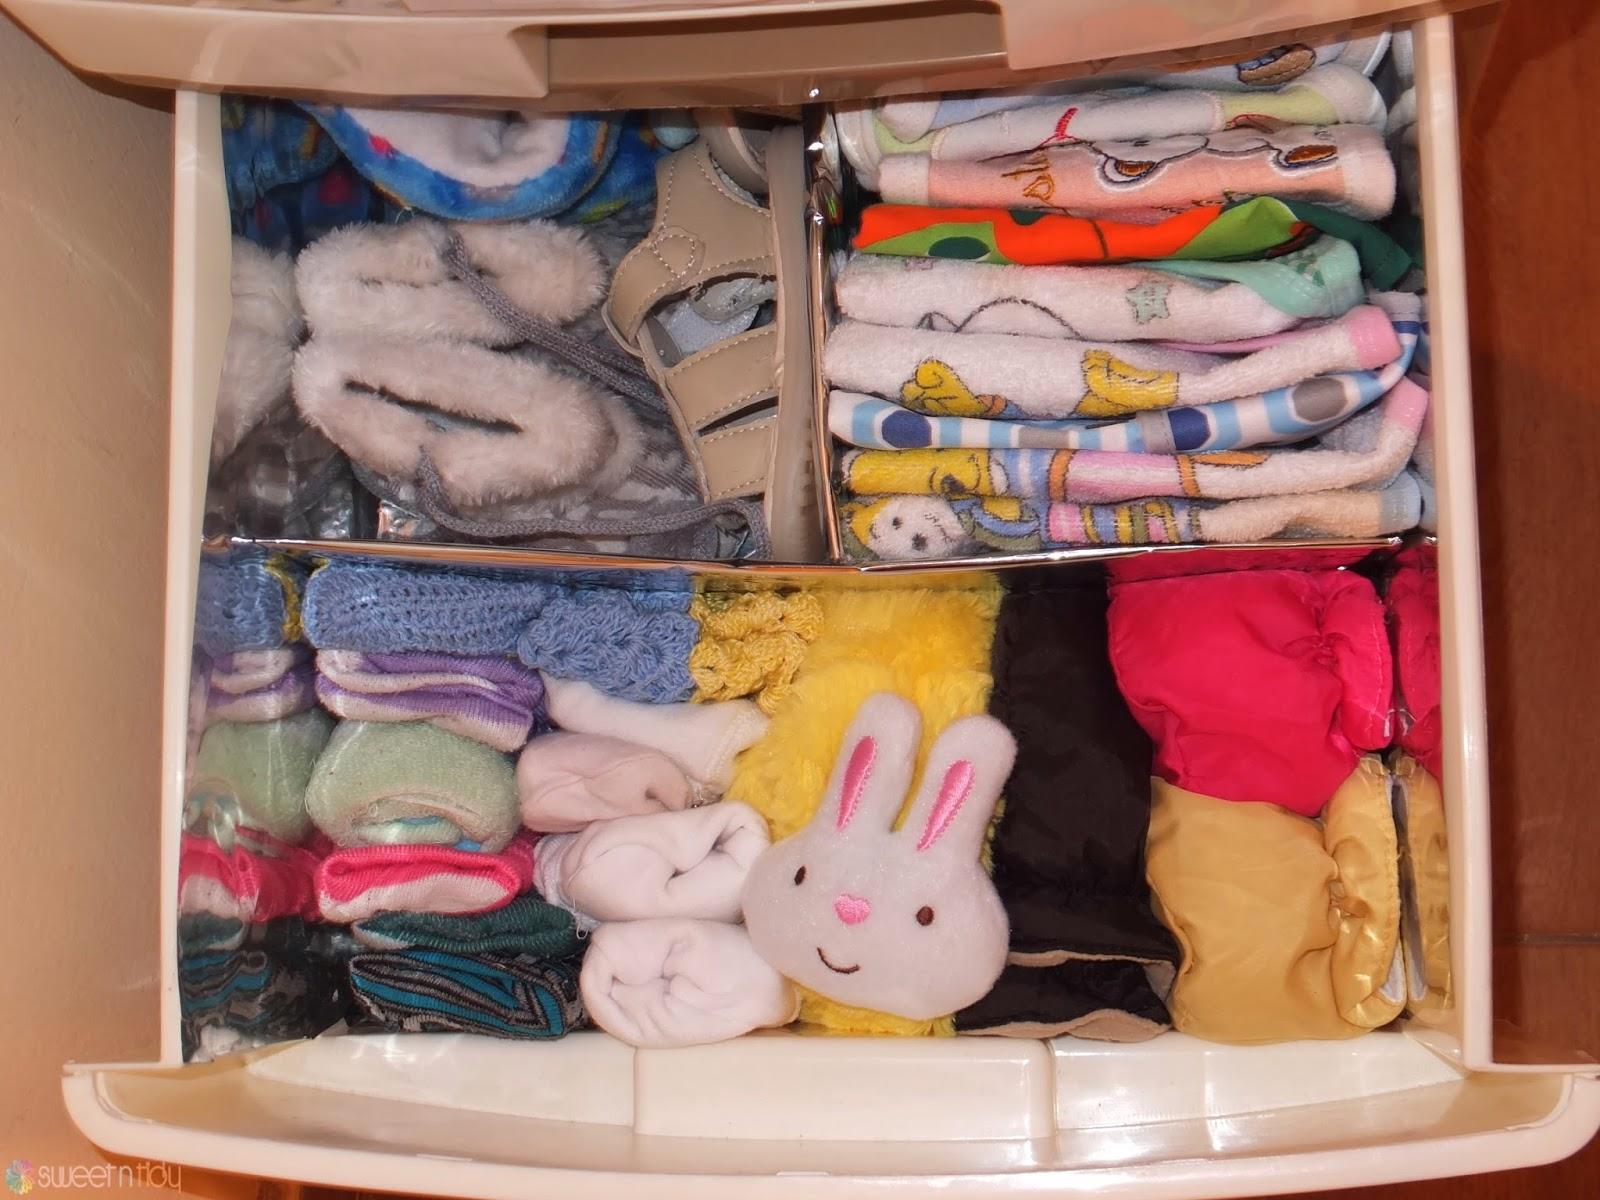 Nursery organizing - My baby dresser